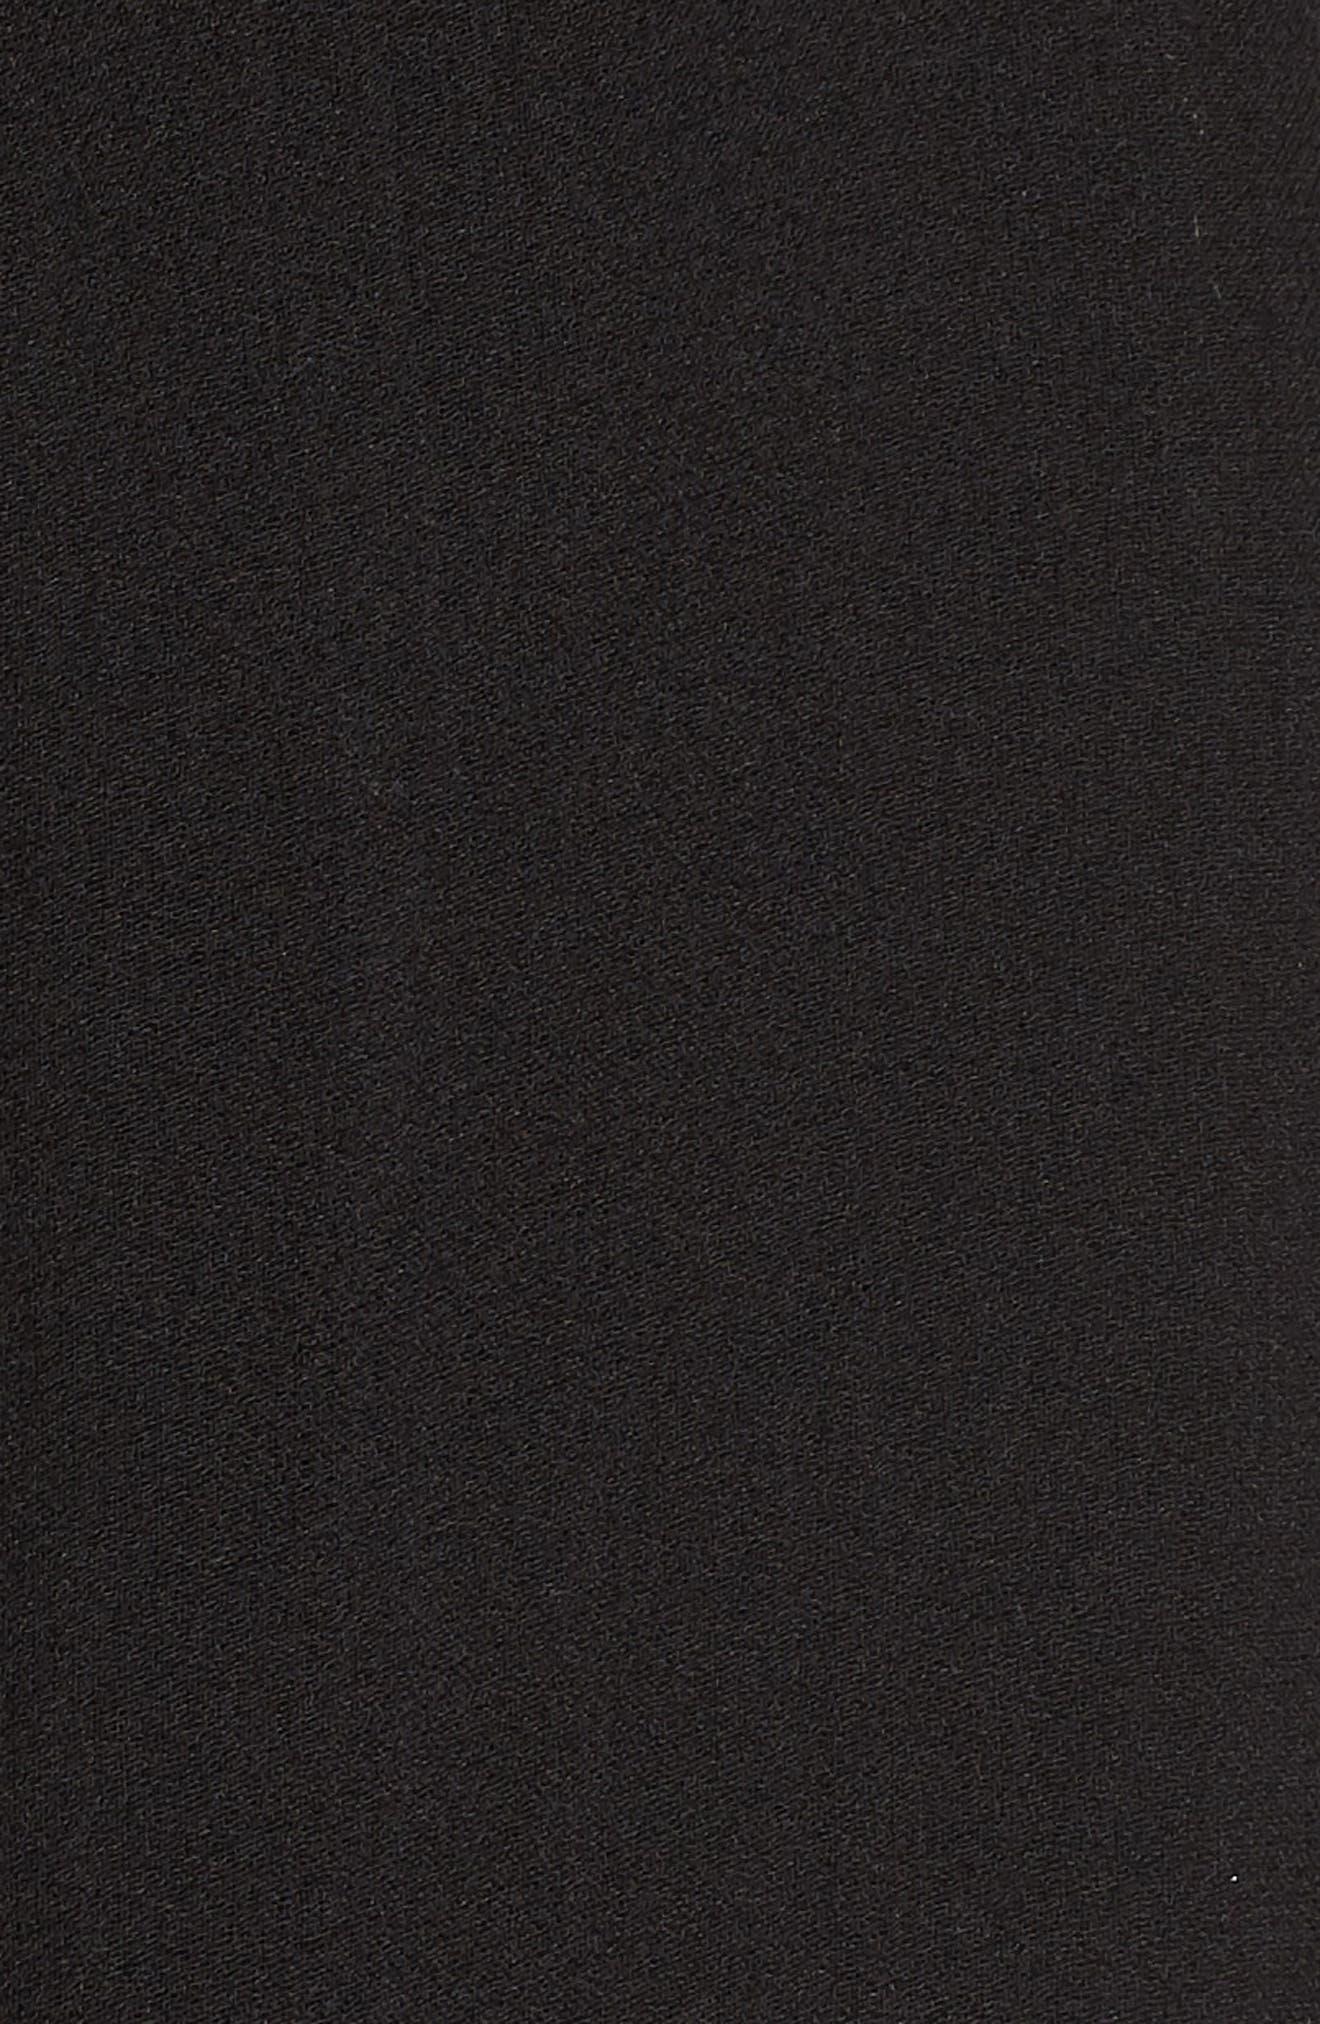 Silk Chiffon Wrap,                             Alternate thumbnail 6, color,                             BLACK